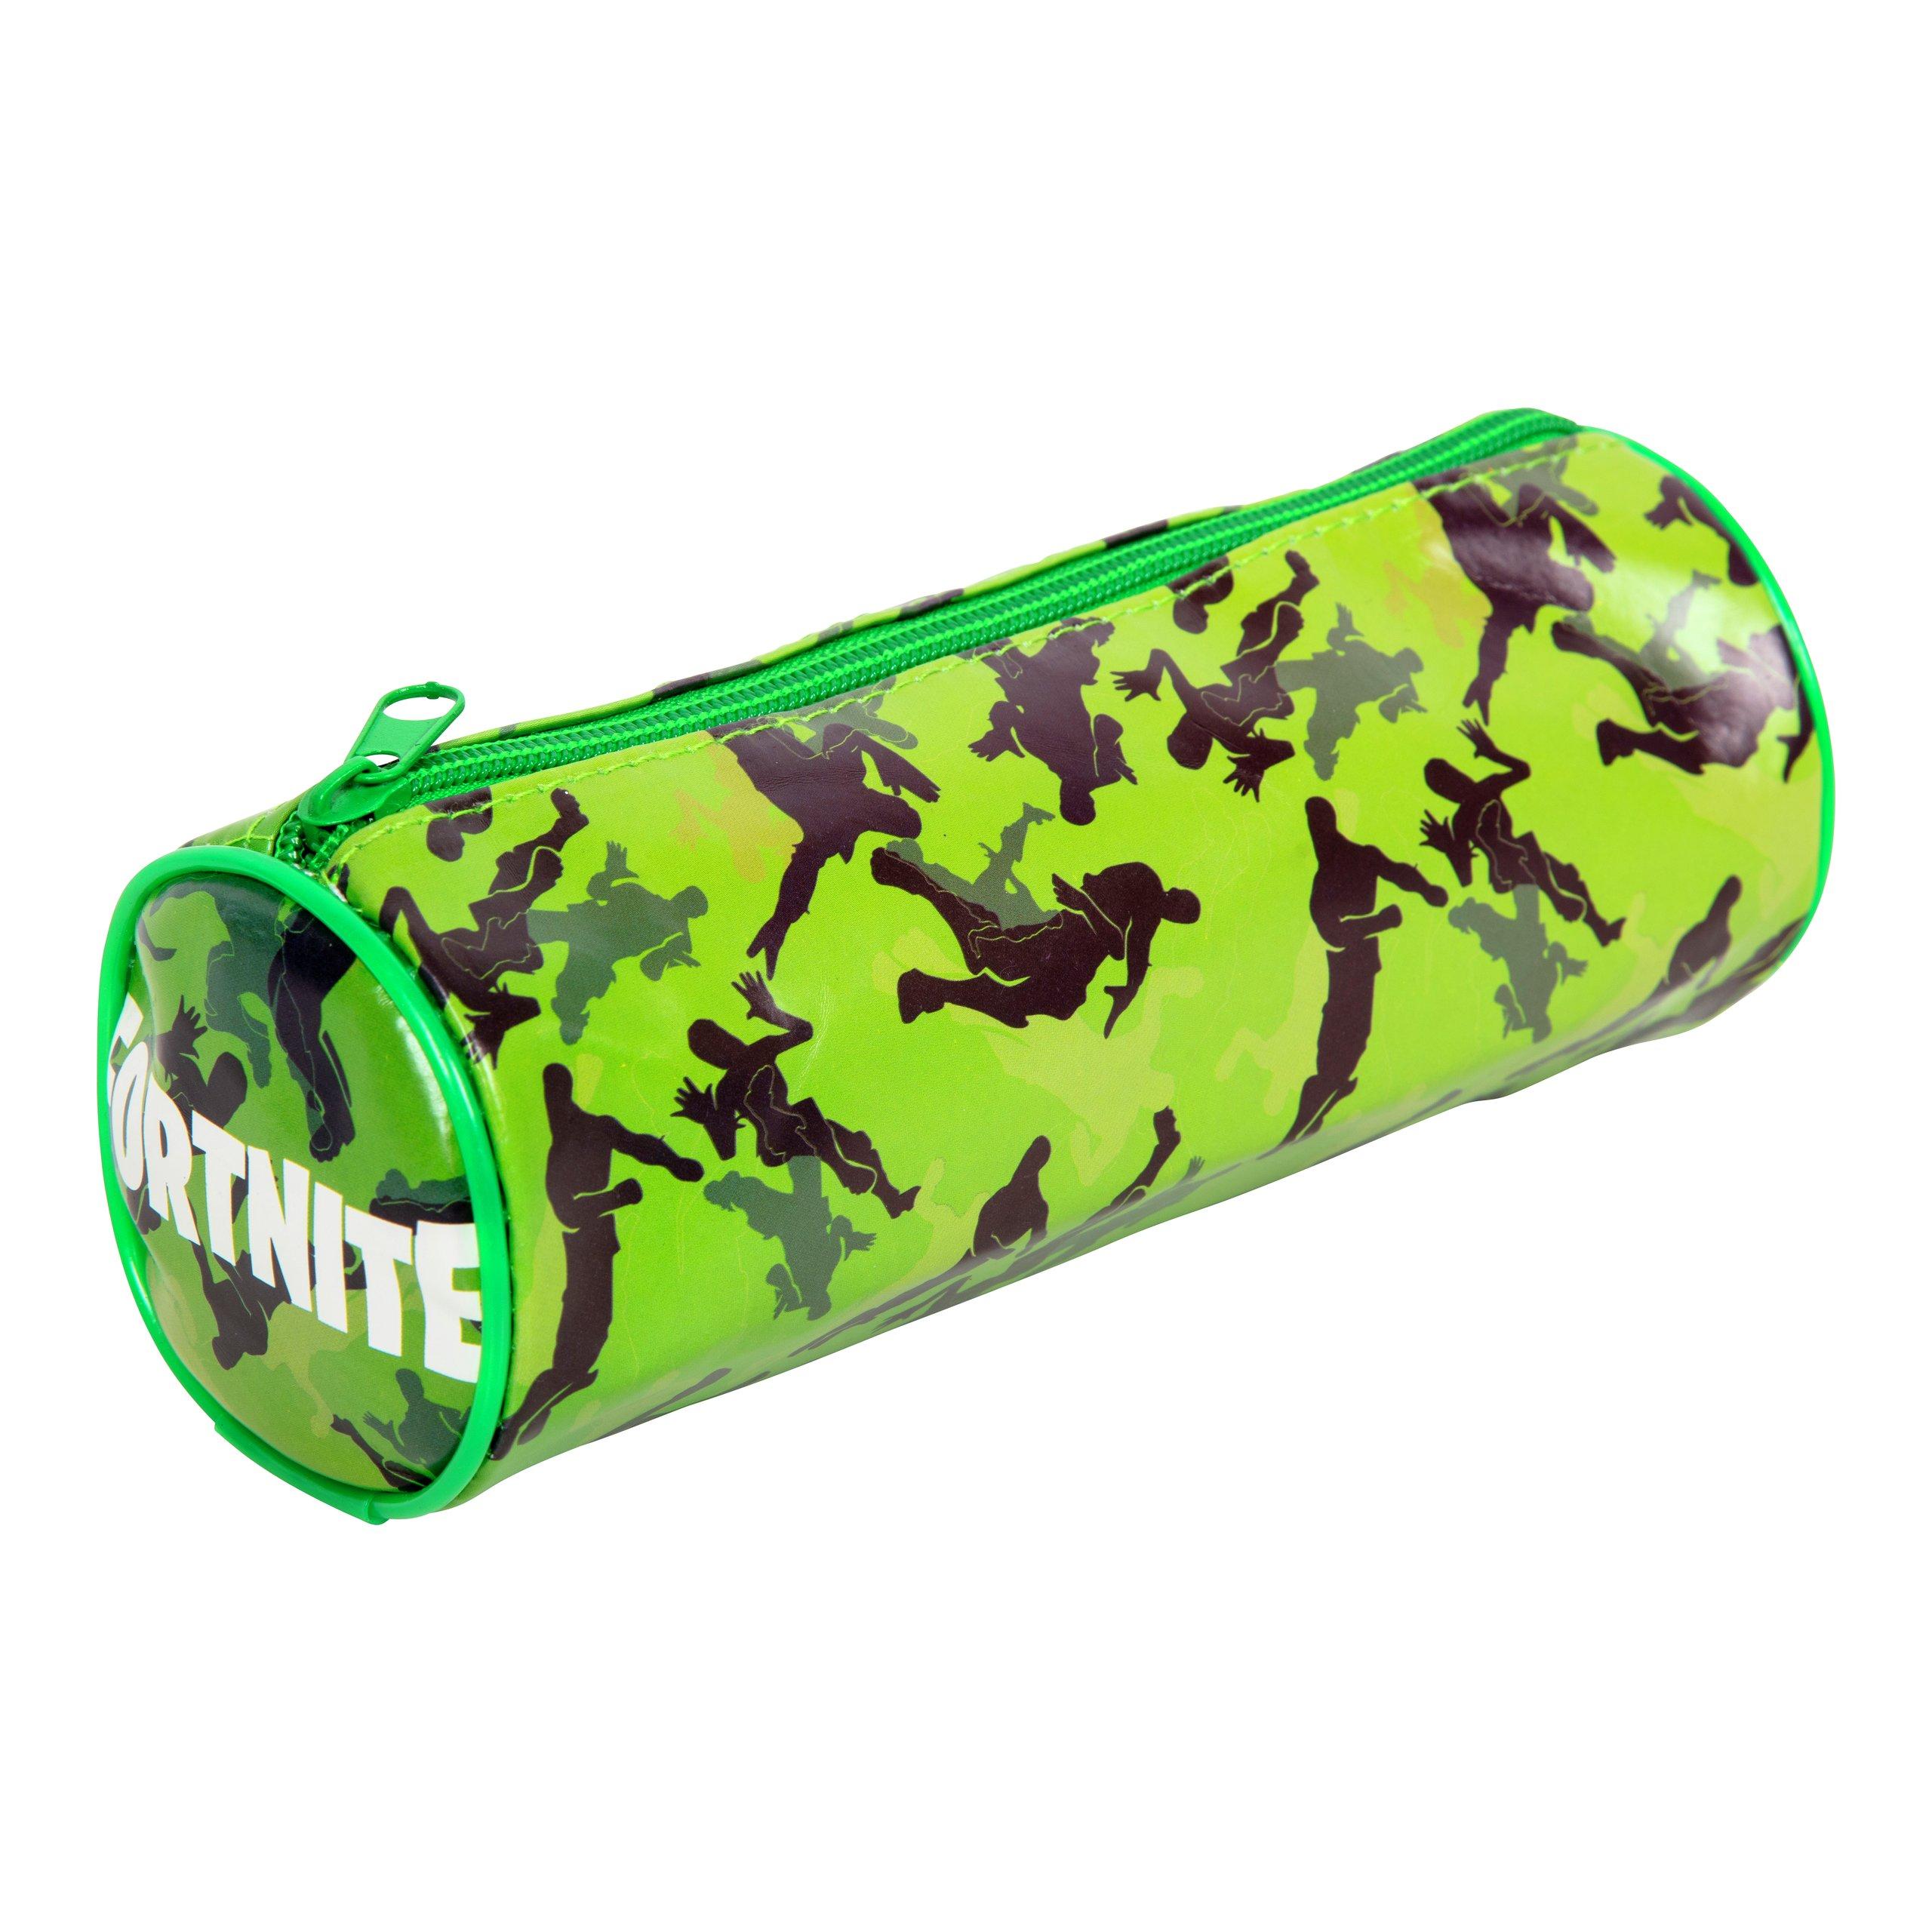 FORTNITE PENNAL -105376